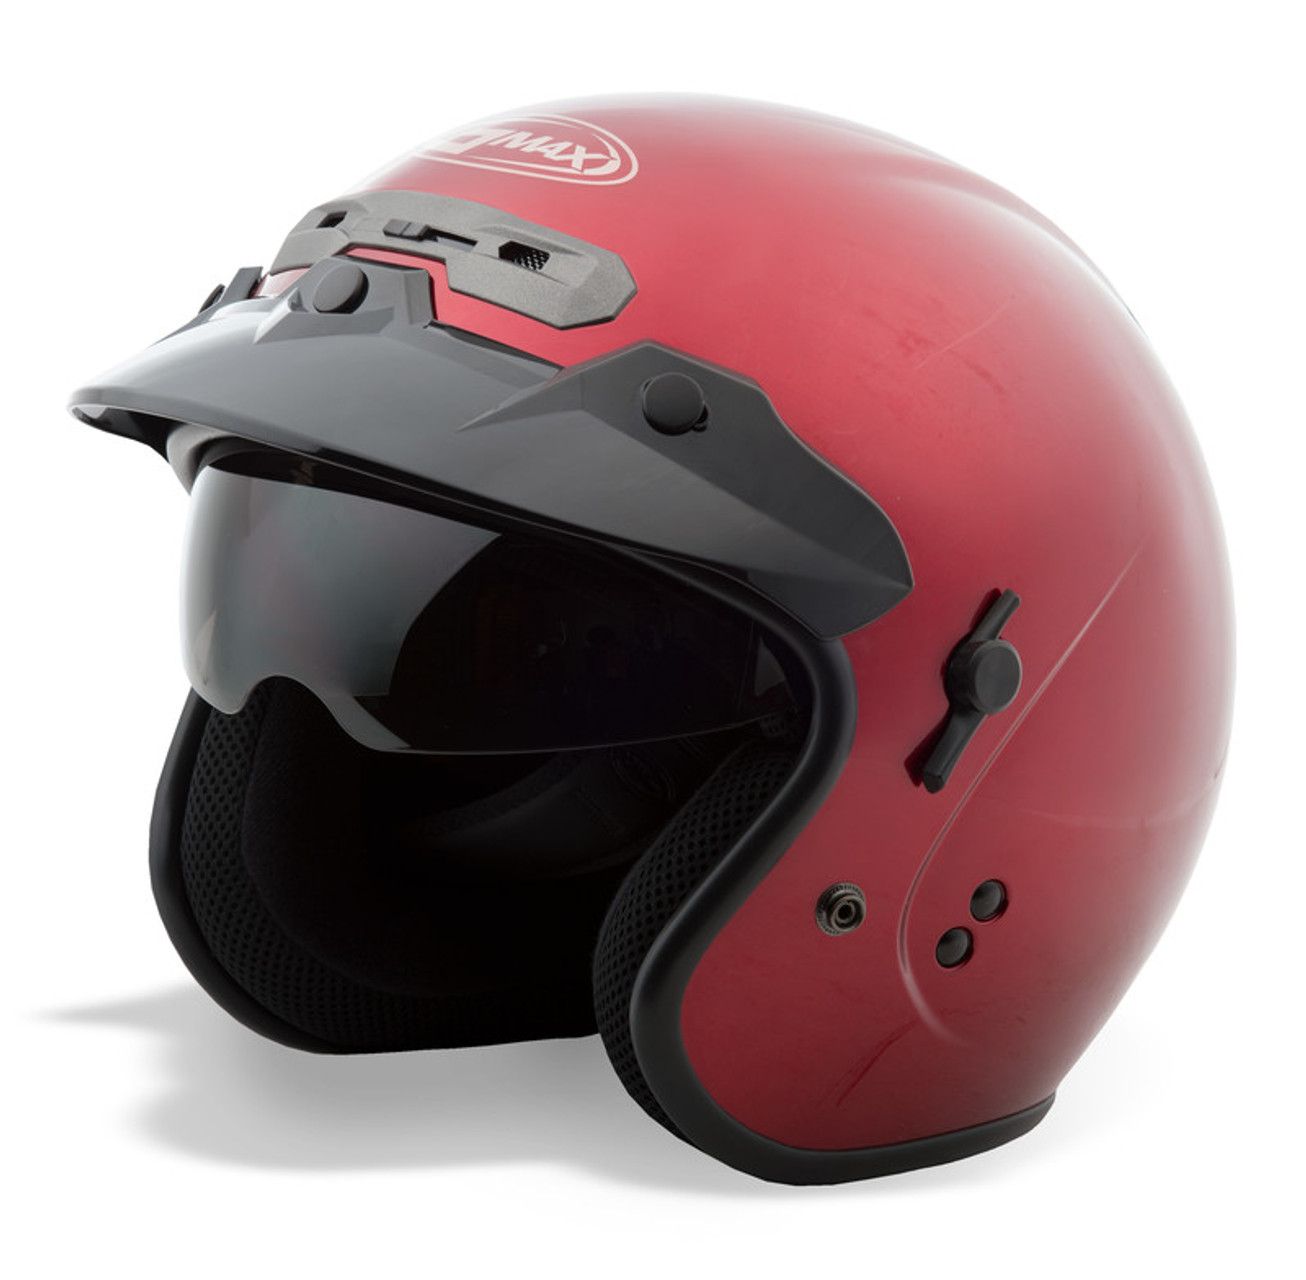 Medium GMAX OF-17 Open-Face Motorcycle Helmet Wine Red